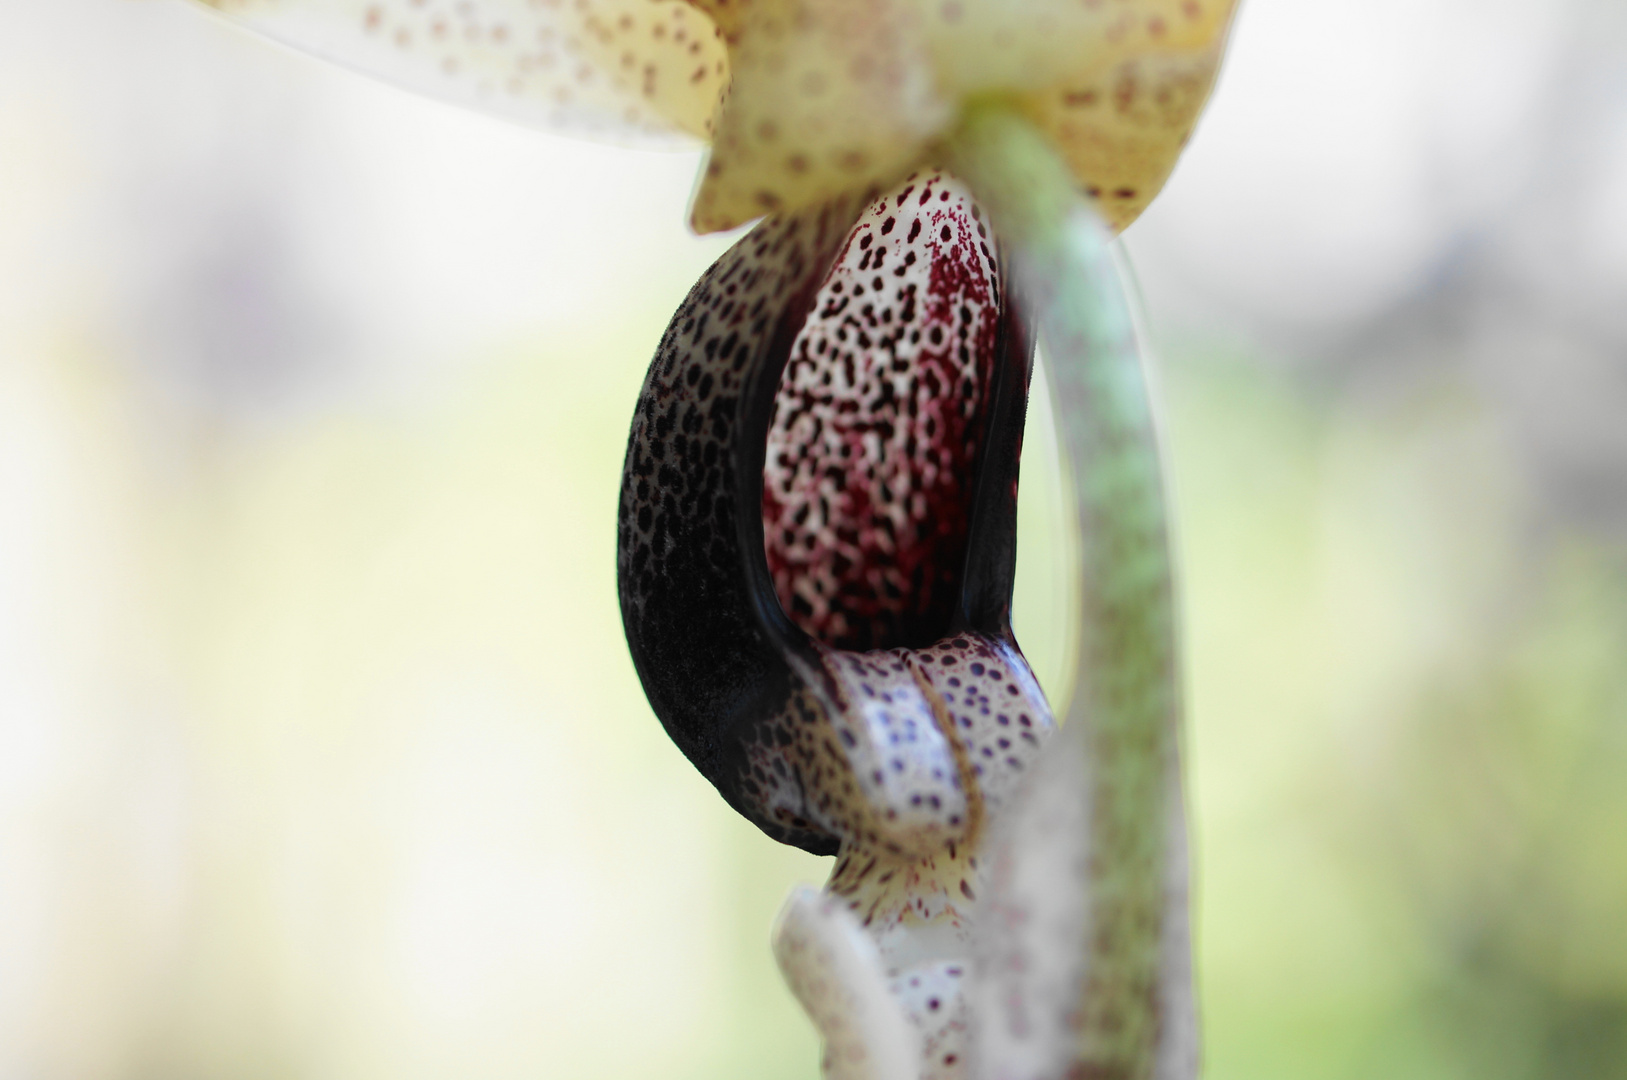 The secret life of plants 2